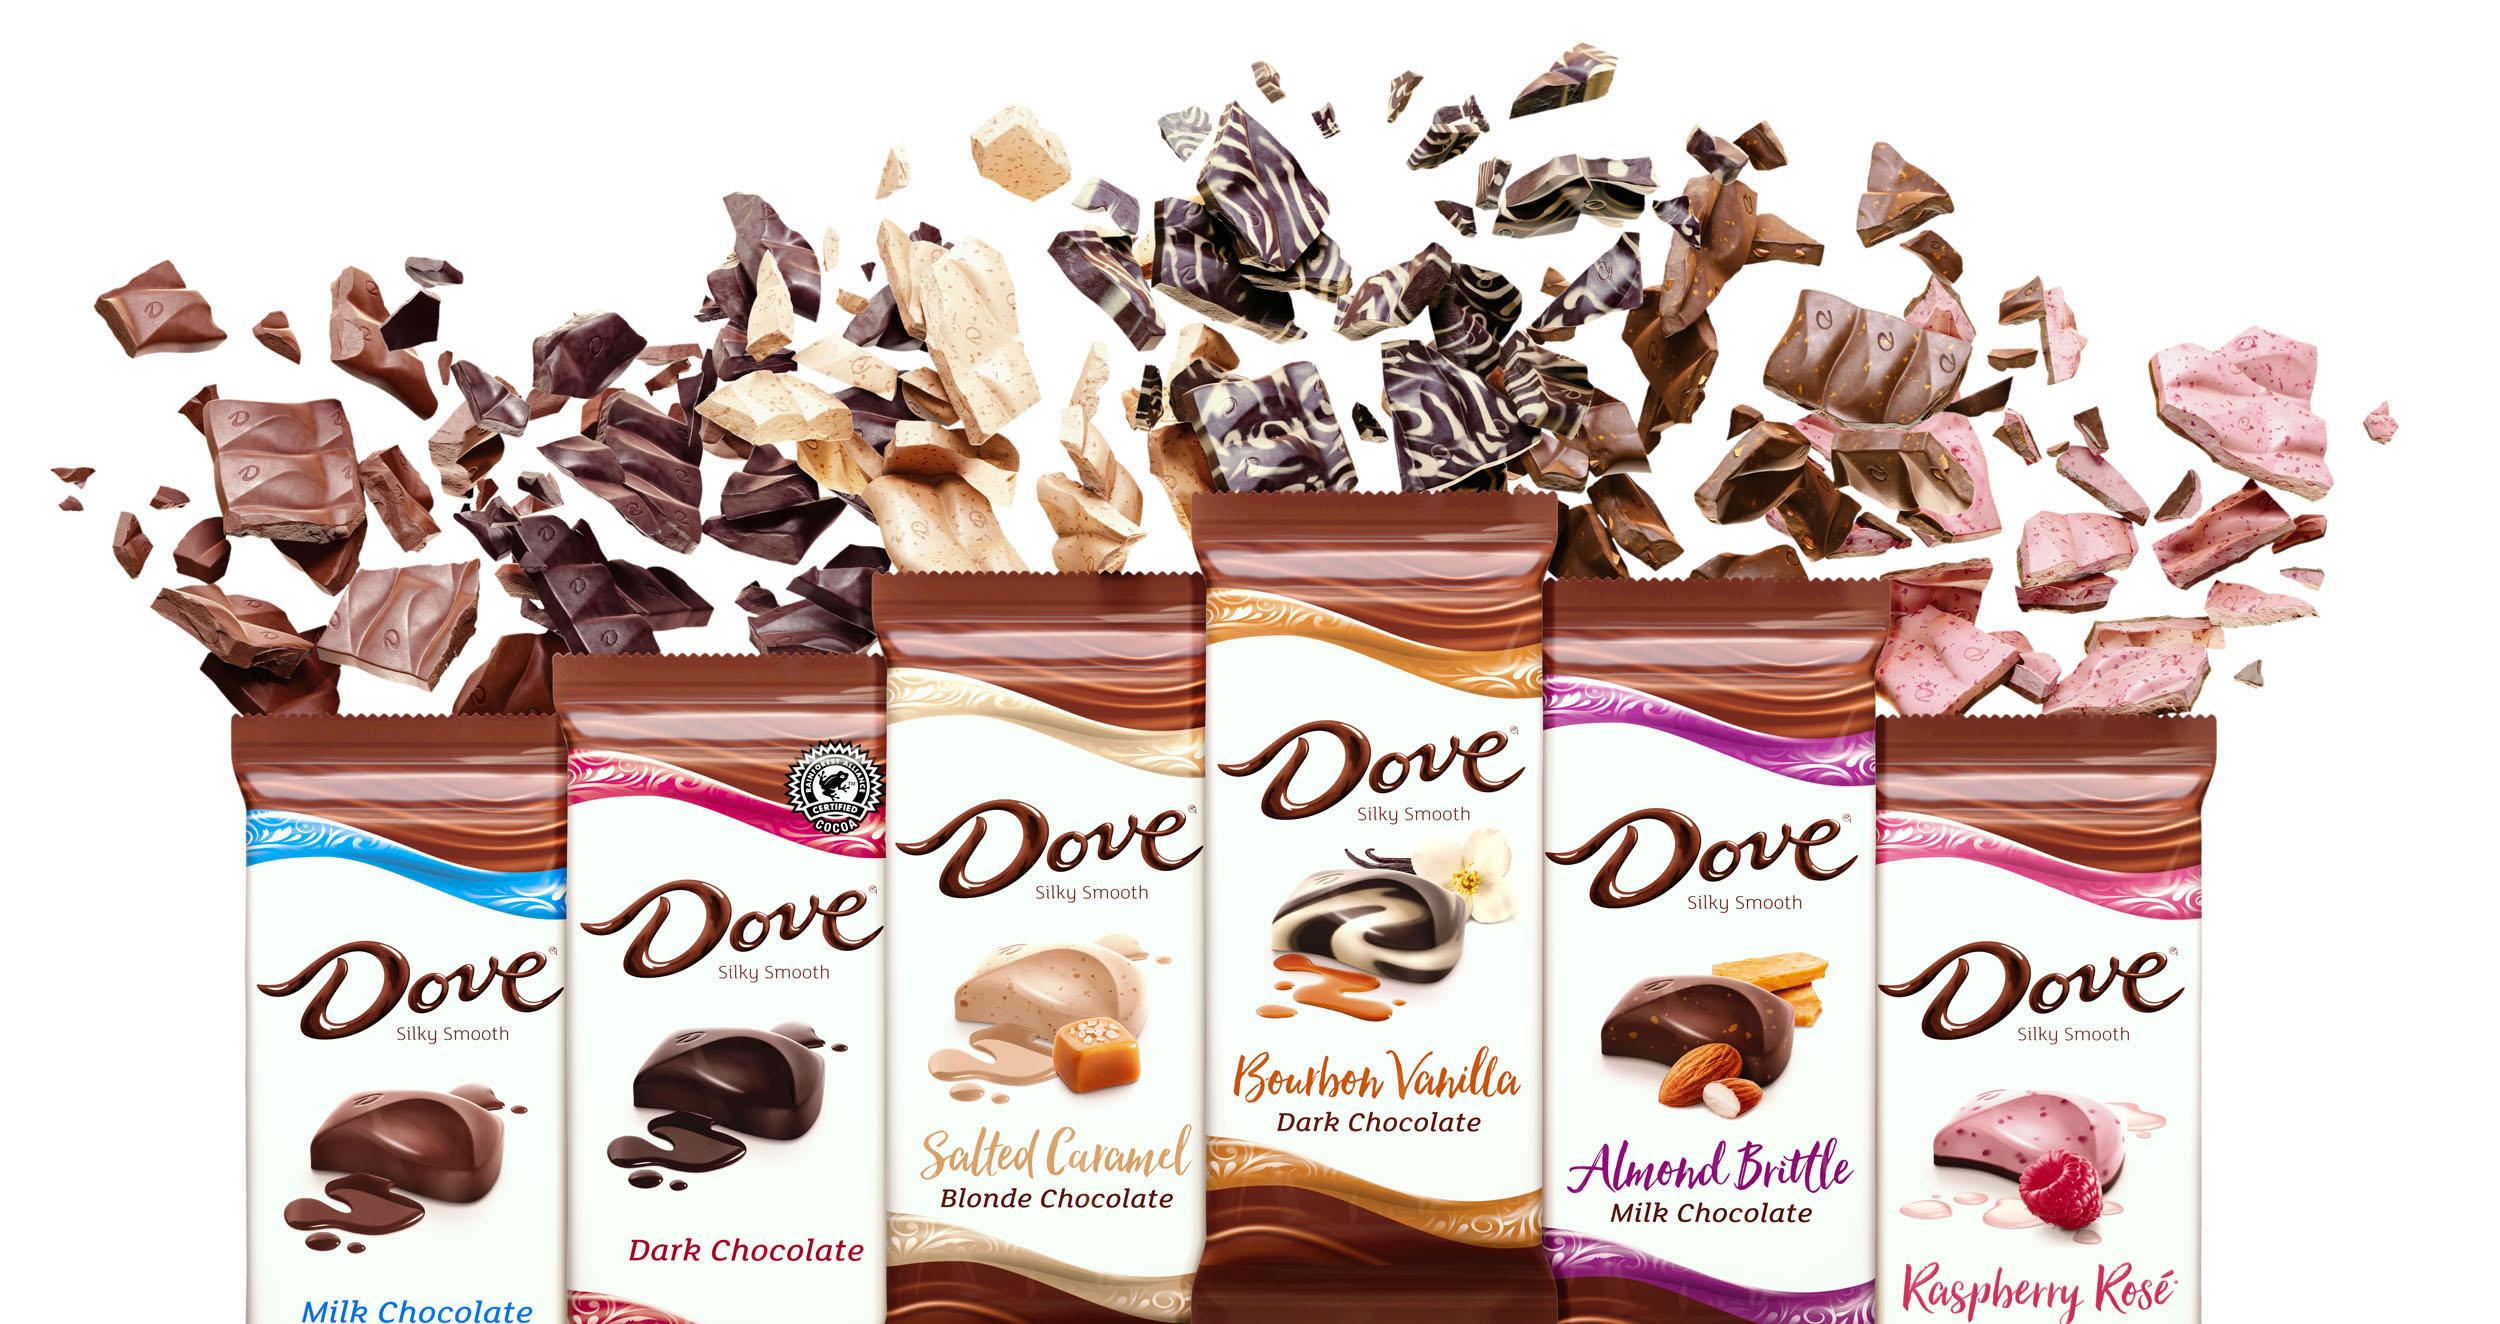 dove-chocolate-bar-explosion